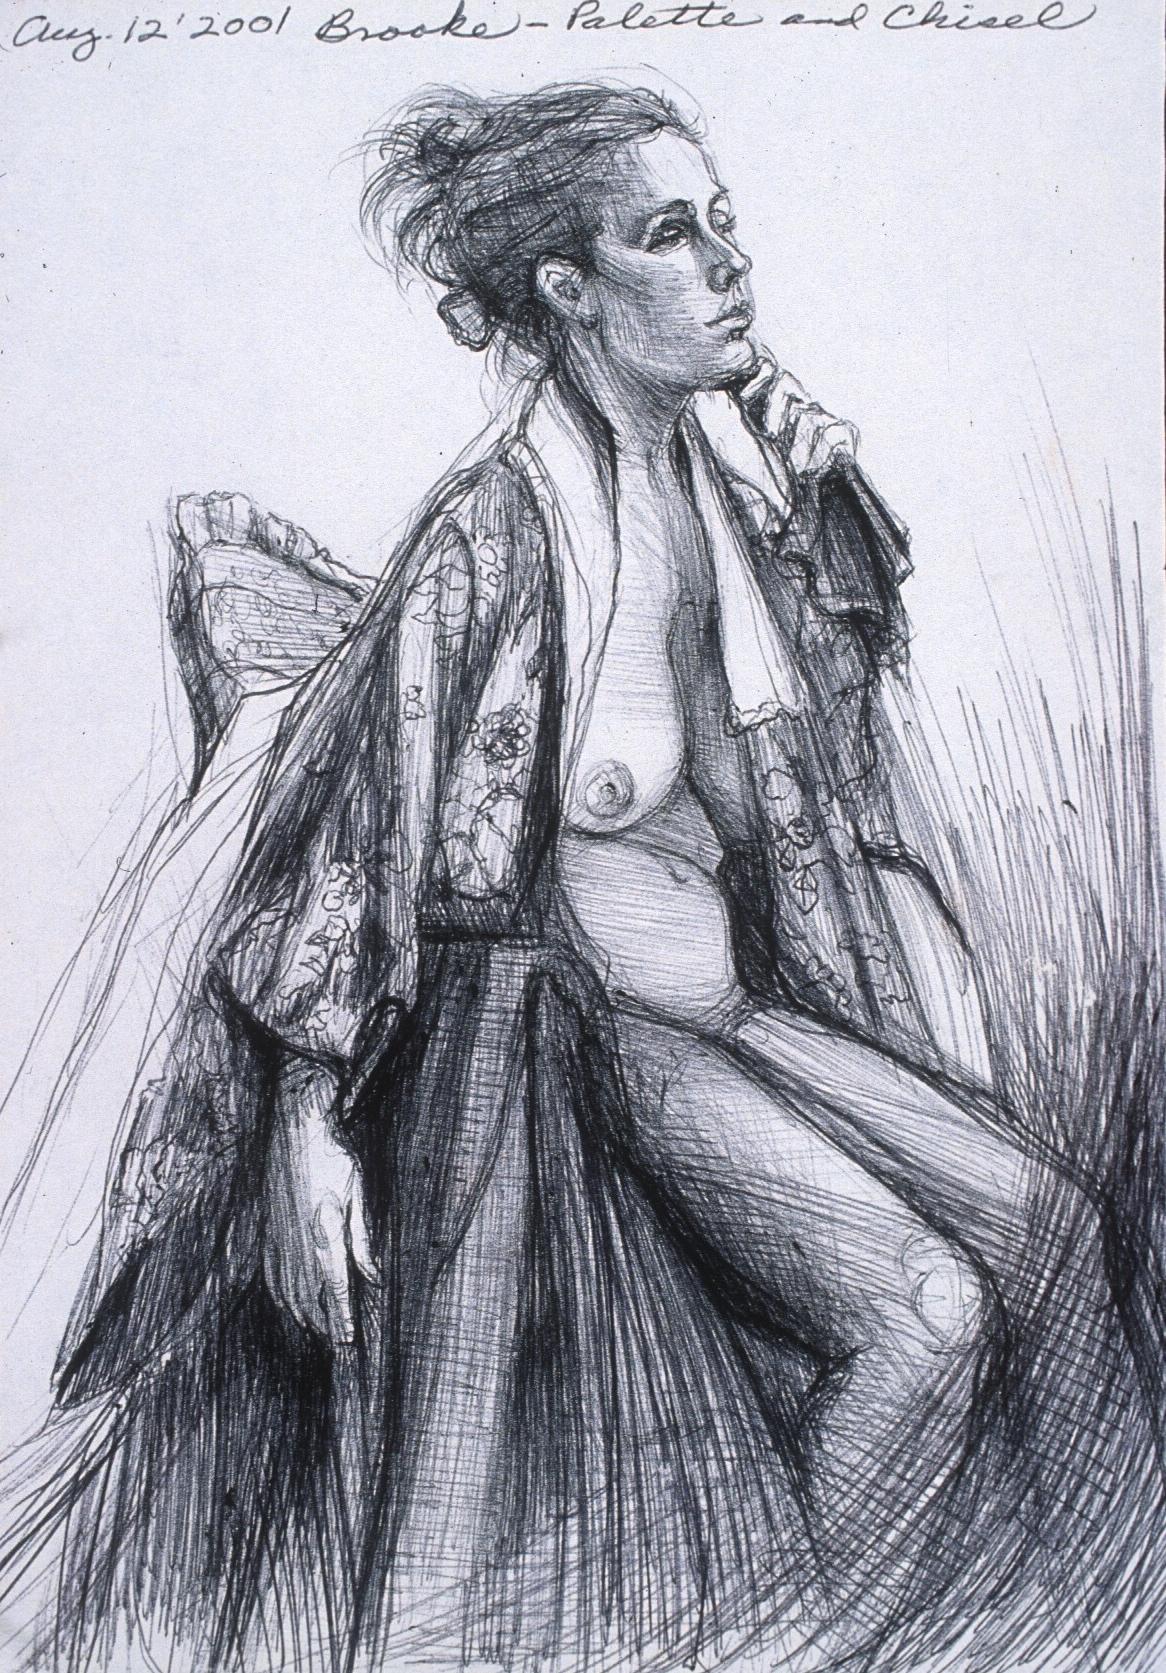 "Lou Ann Burkhardt  Brooke  , 2001 Pen and ink on paper 13-1/2"" x 16-1/2"", framed $395"